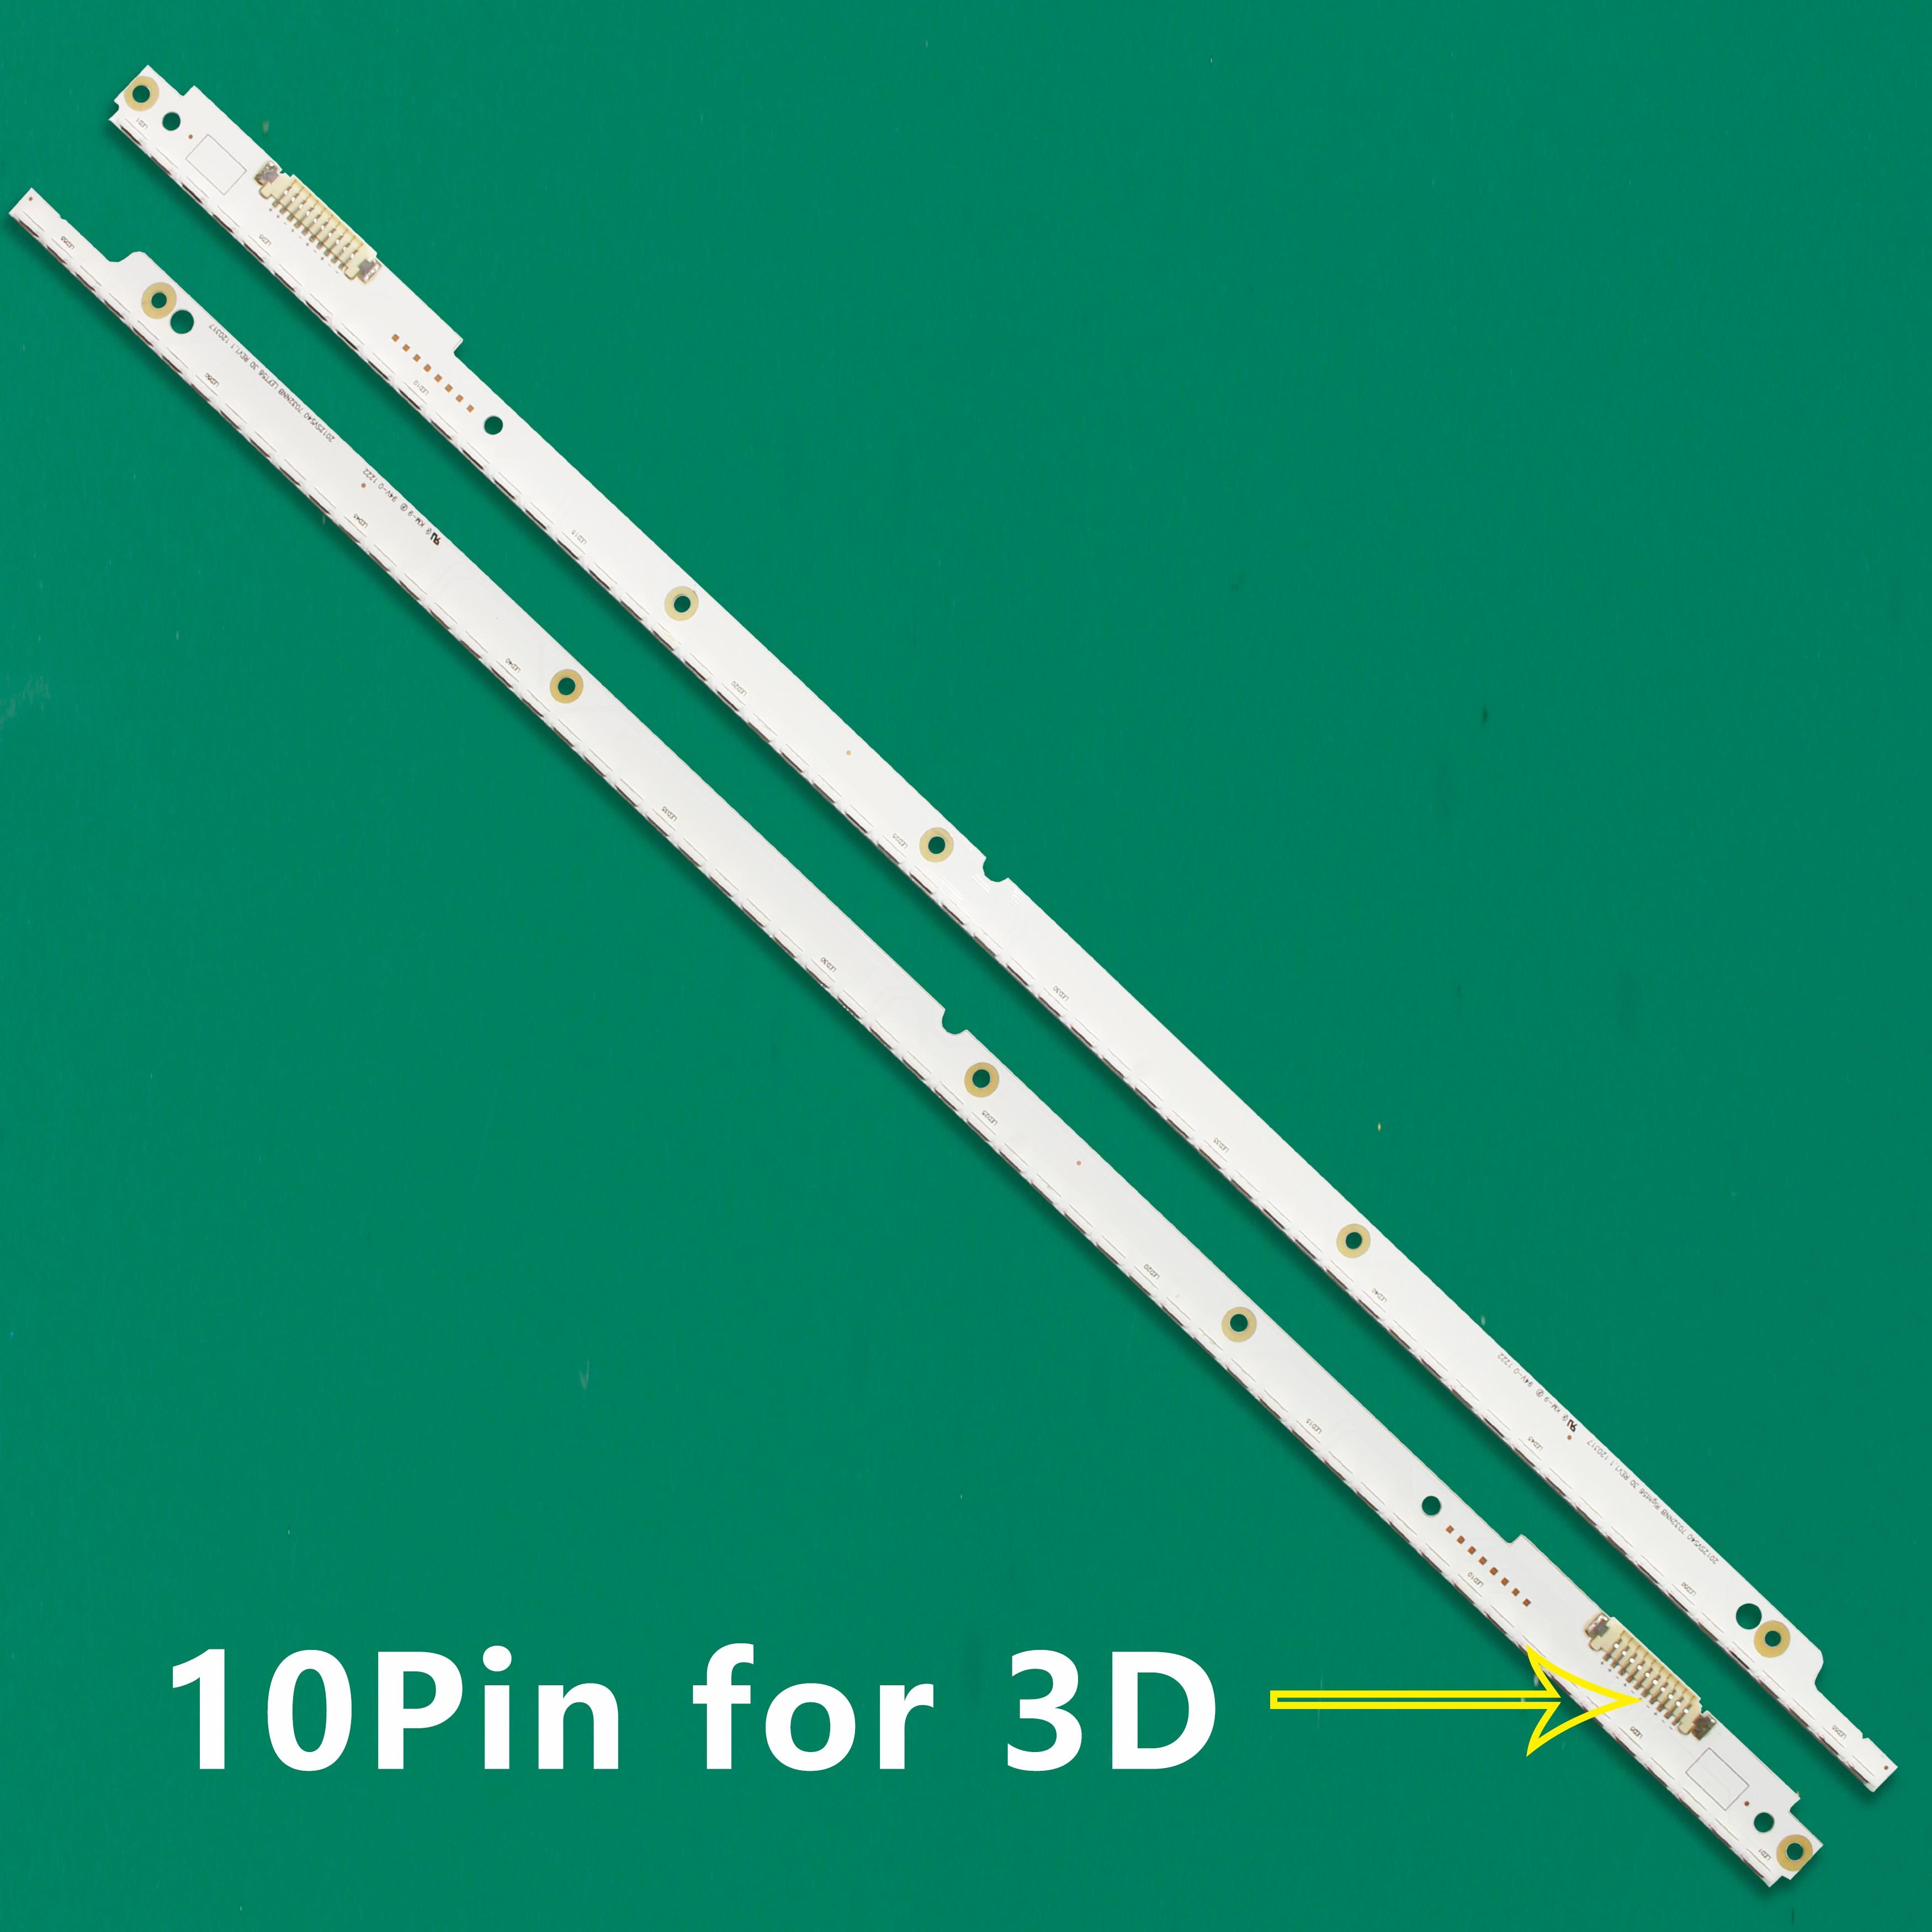 LED Backlight Lamp strip For UE40ES6530 UE40ES6800 UA40ES6100  2012SVS40 7032NNB 3D R2GE 400SMB R3 A BN96 21712A BN96 21711AIndustrial  Computer